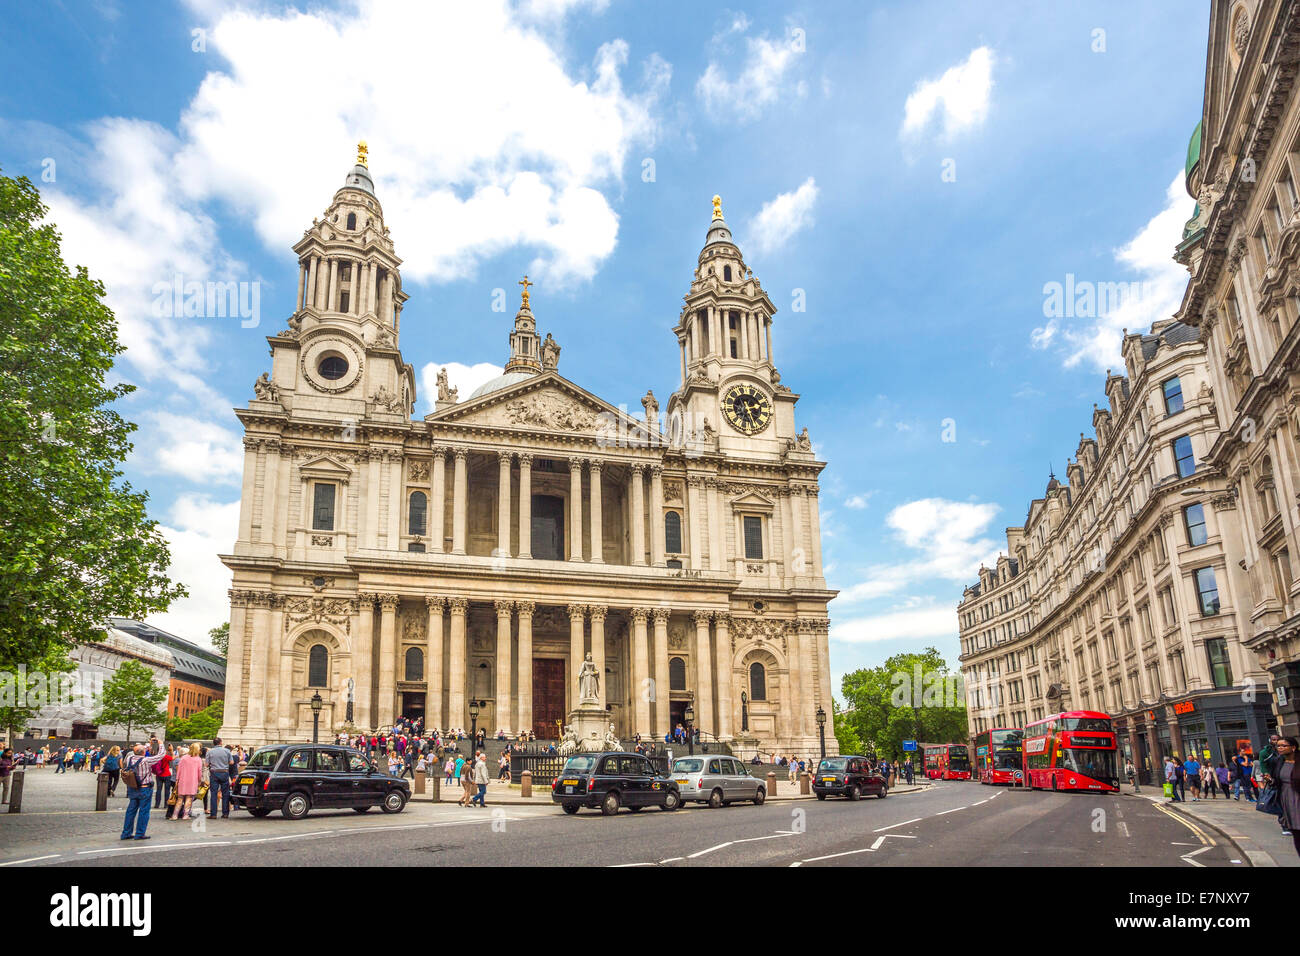 Avenue, Gebäude, Kathedrale, Stadt, London, England, St. Paul, UK, Architektur, Geschichte, Religion, Tourismus, Stockbild